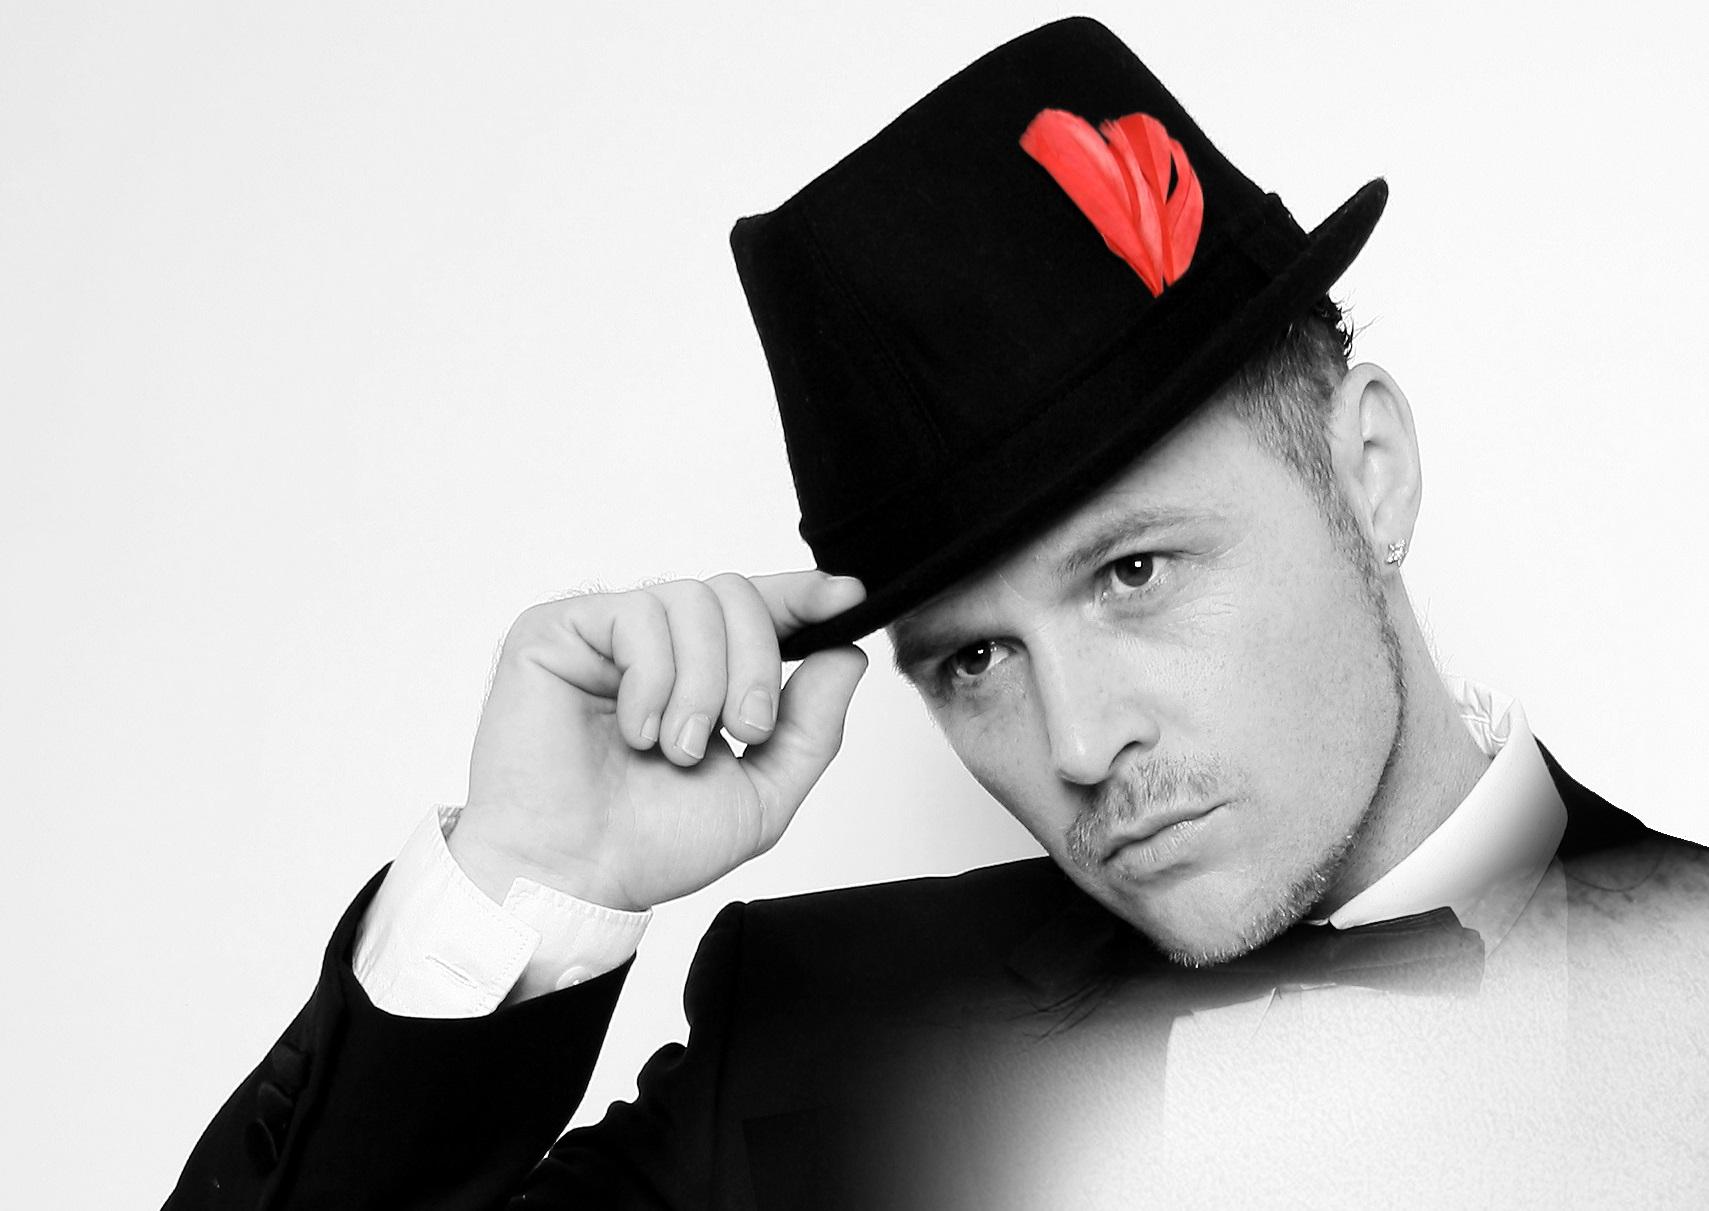 Justin Timberlake Tribute Act - Robbie Glenn